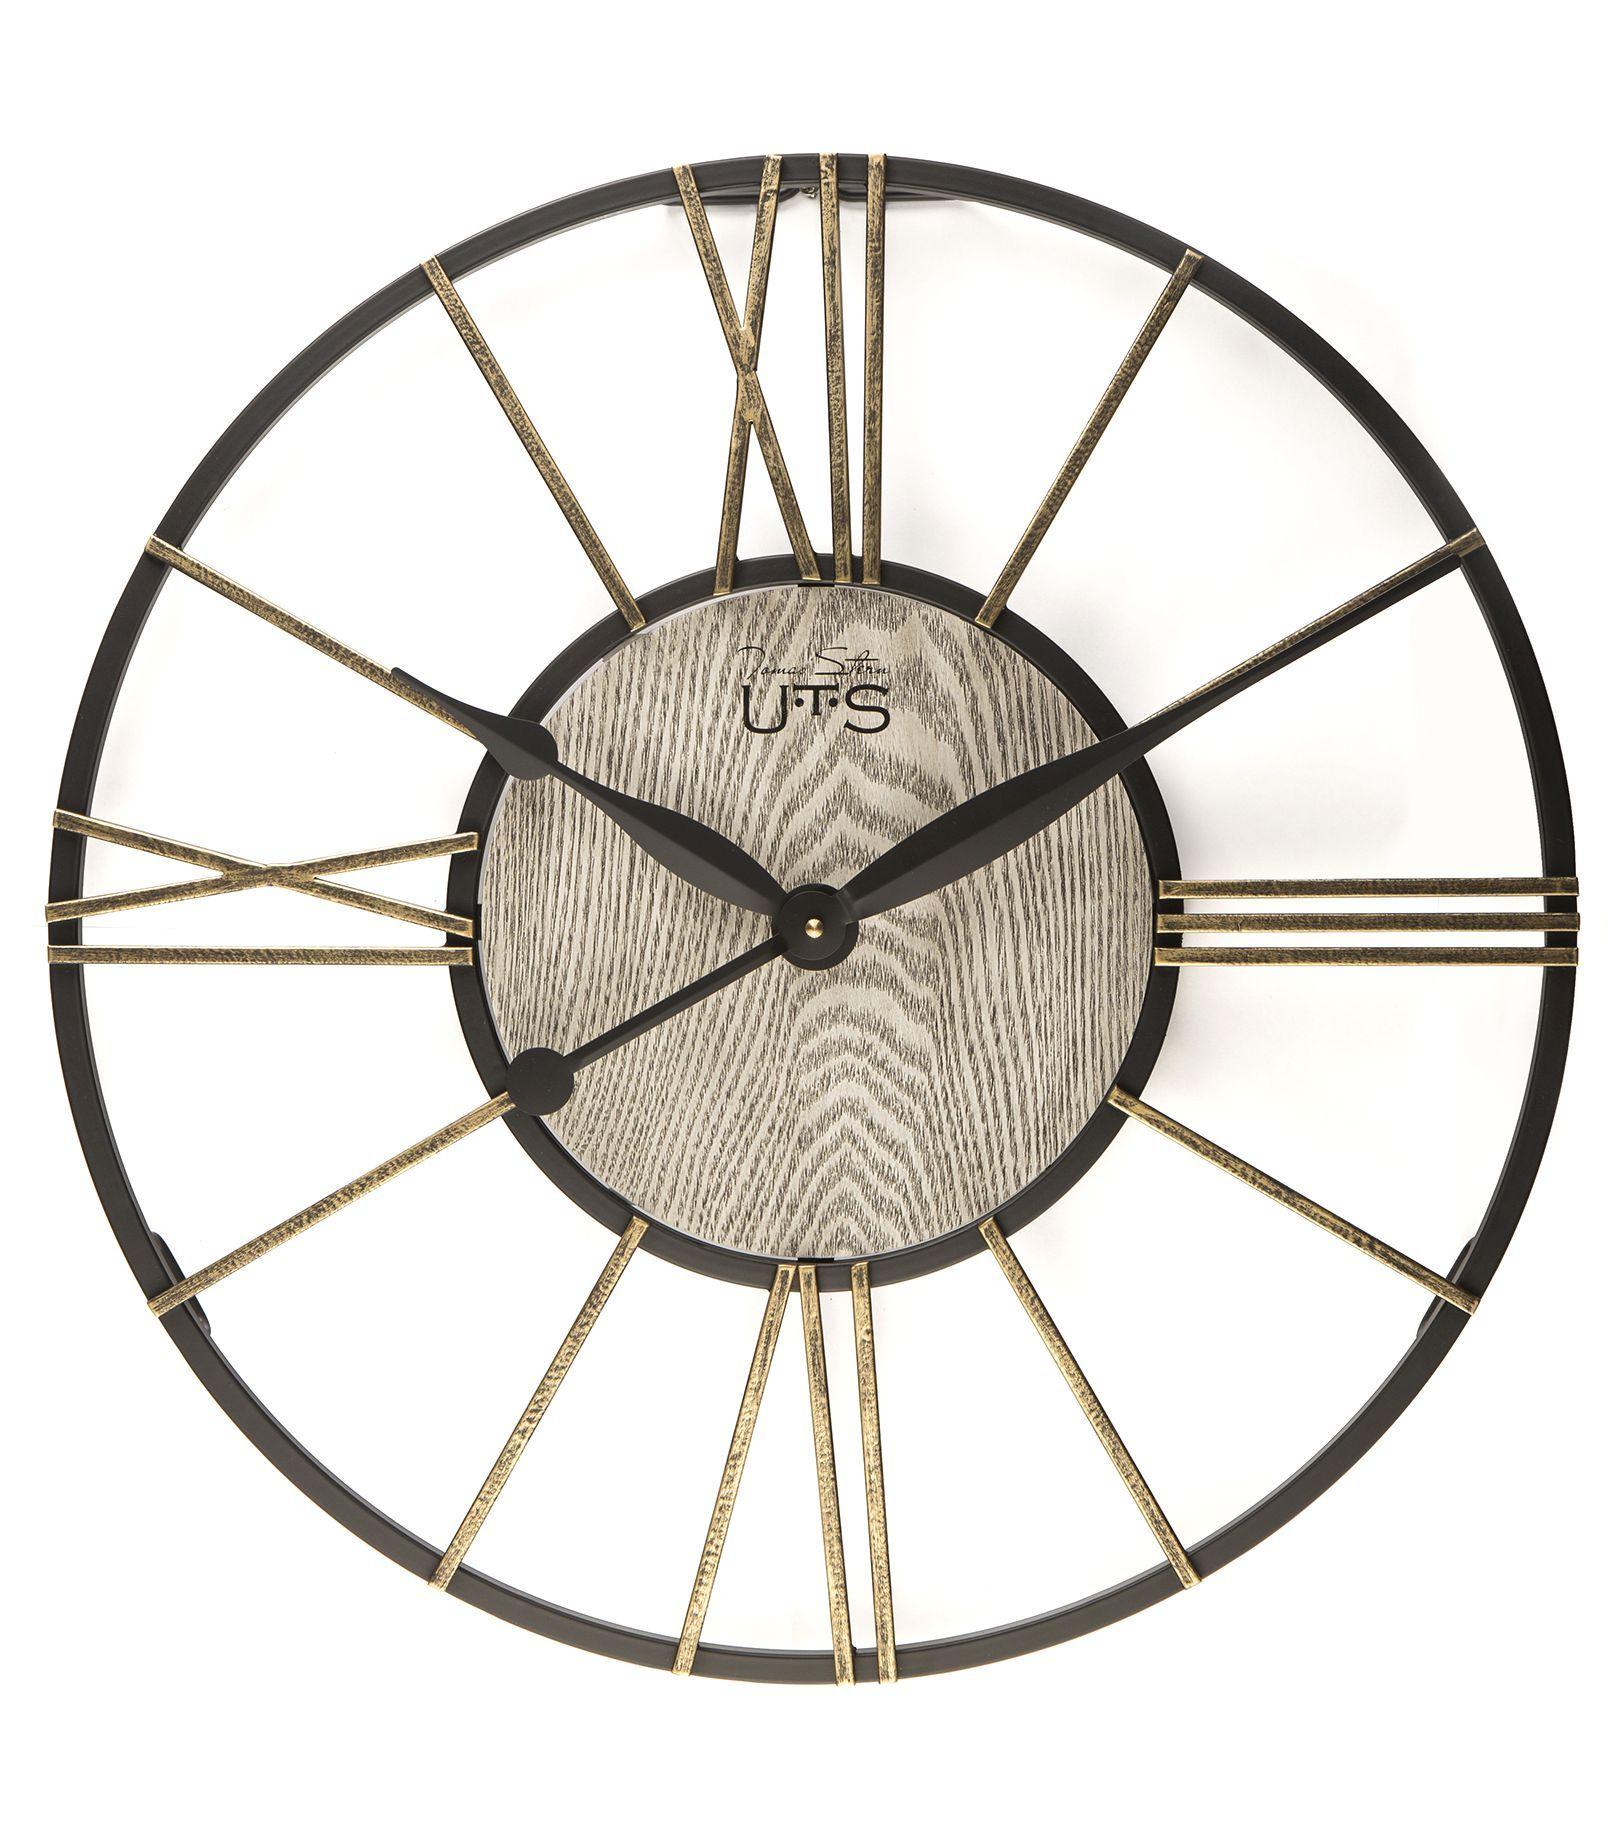 Часы настенные Часы настенные Tomas Stern 9007 chasy-nastennye-tomas-stern-9007-germaniya.jpg